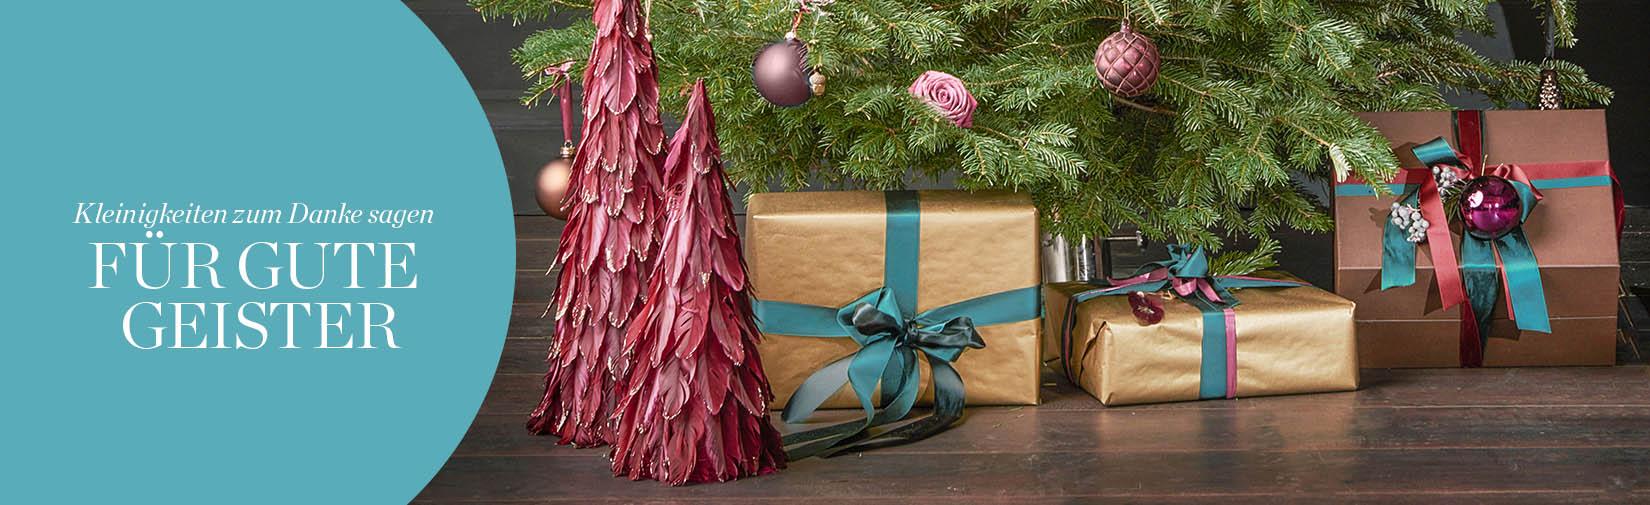 LP_Geschenke-SpezialLP-Geschenke-Special_gute-geister-desktop